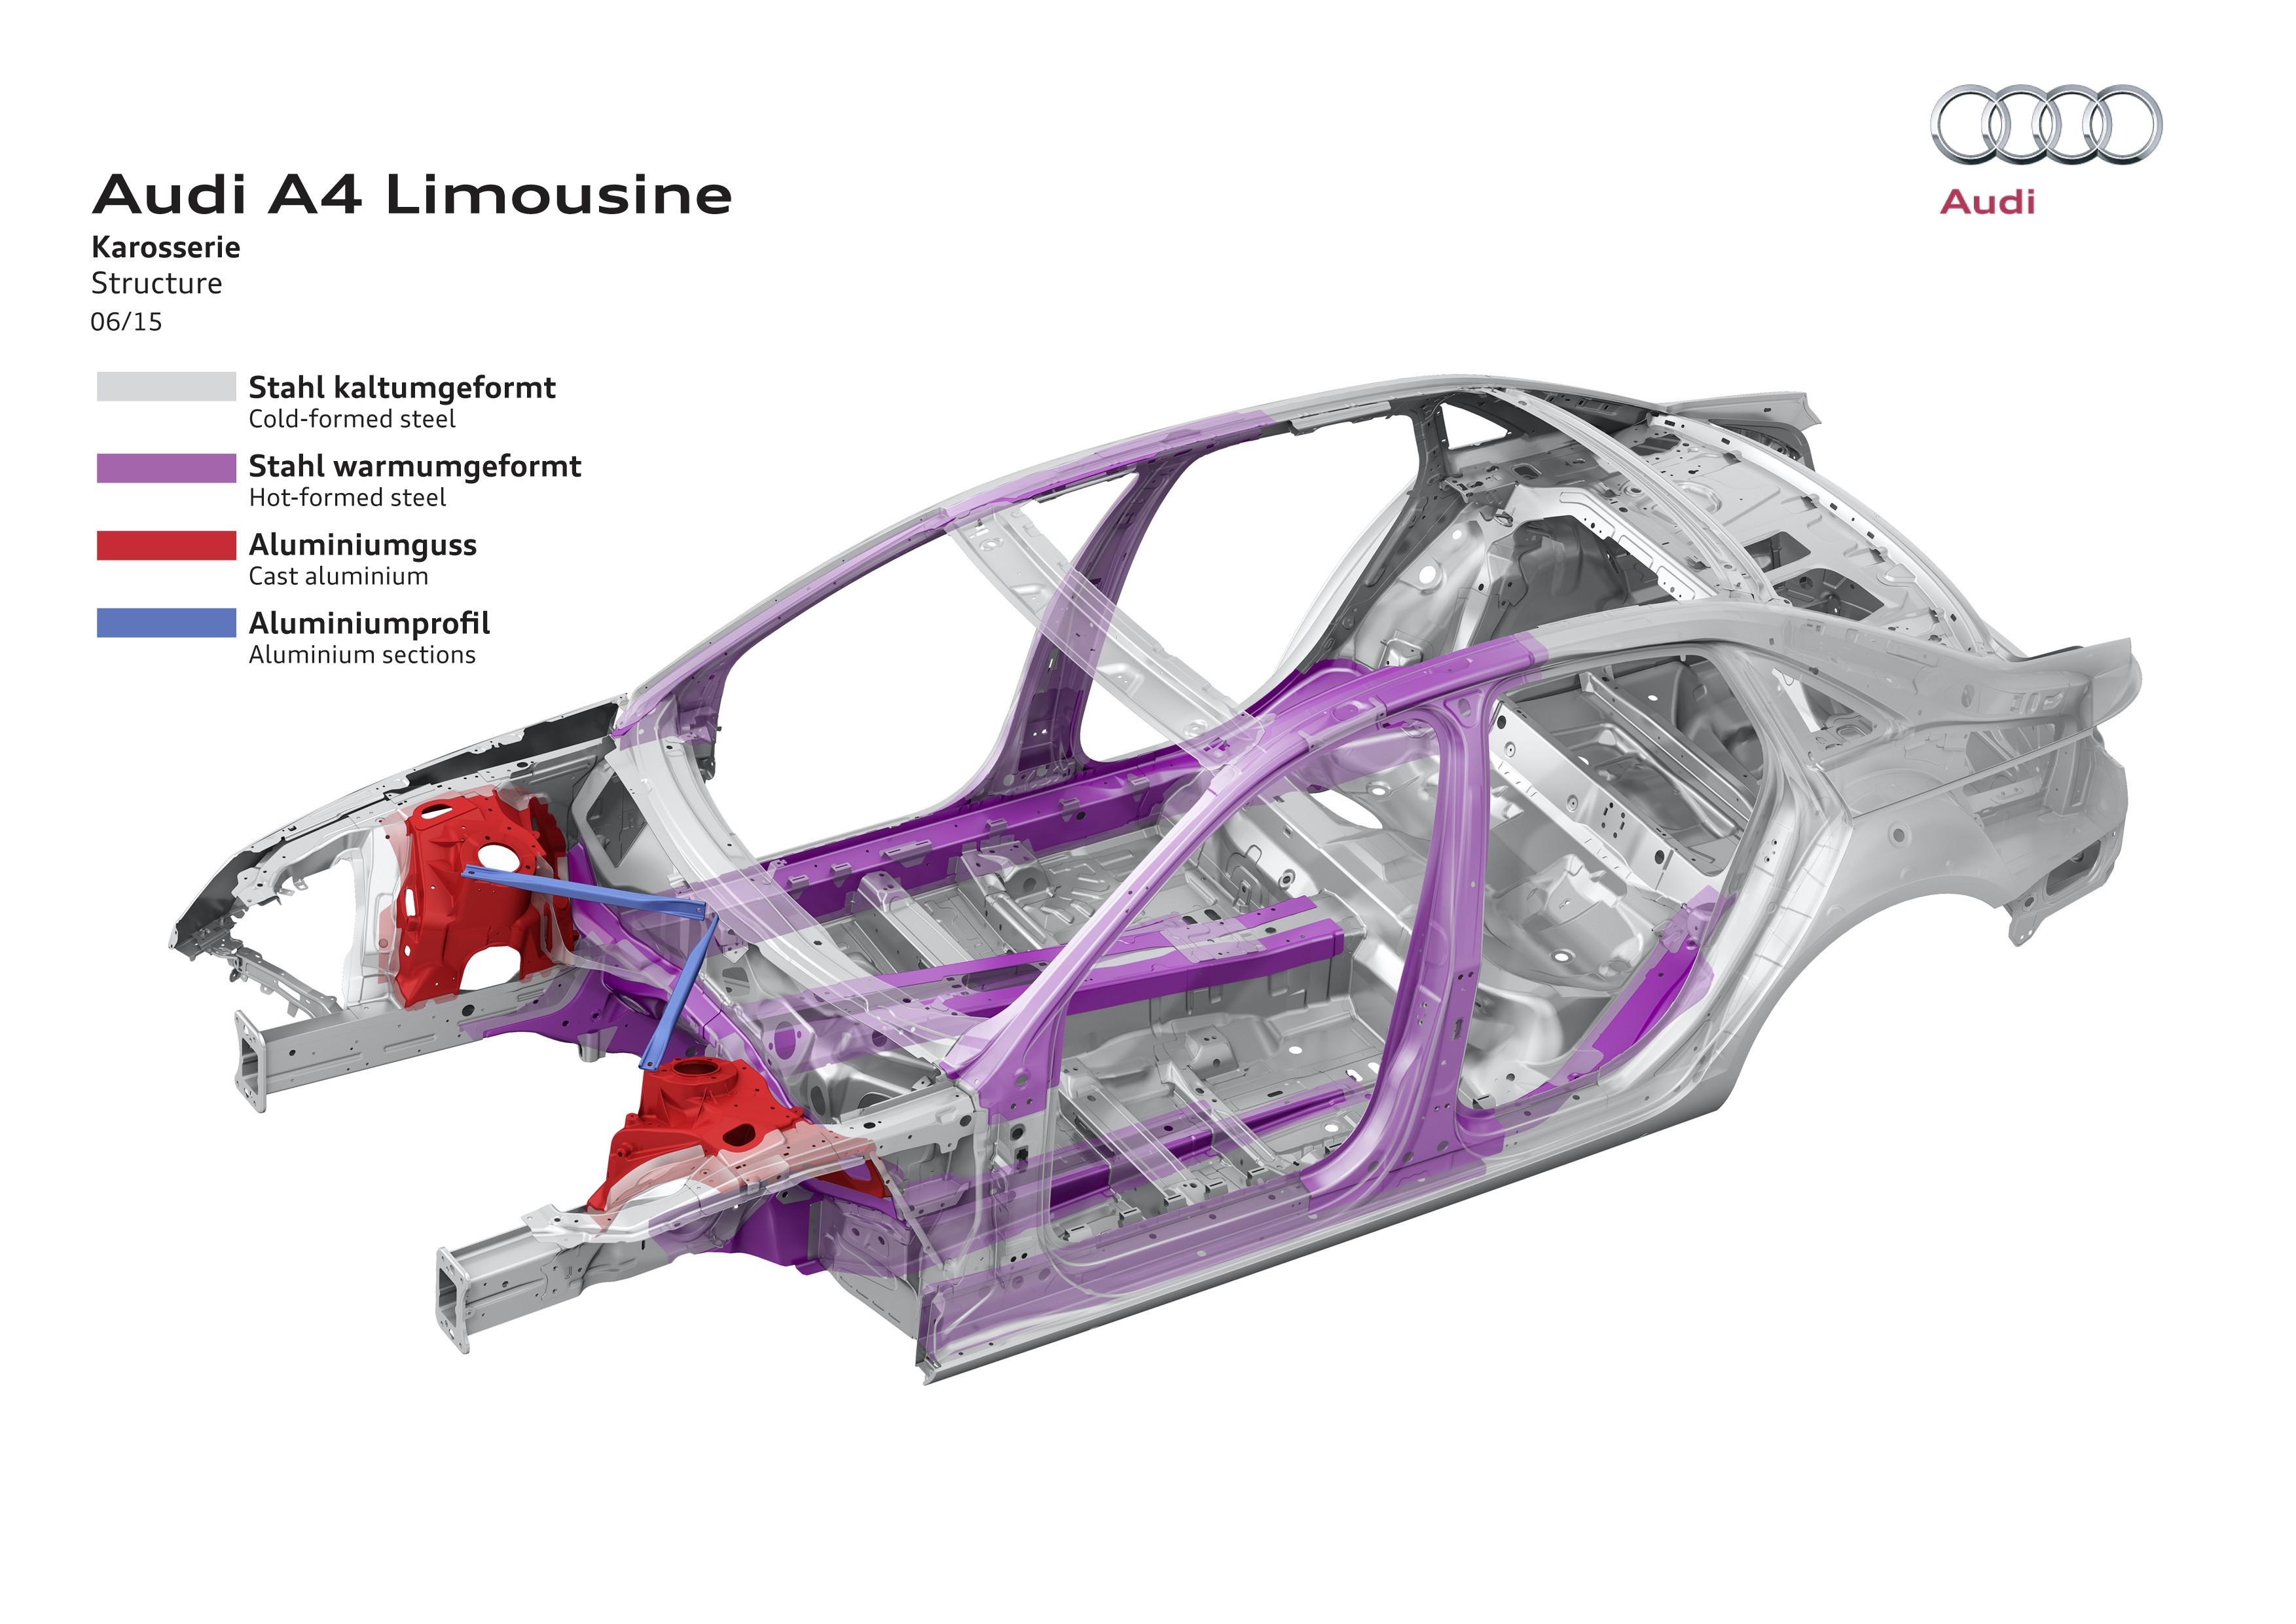 2017 Audi A4 Larger But 264 6 Pounds Lighter  Includes